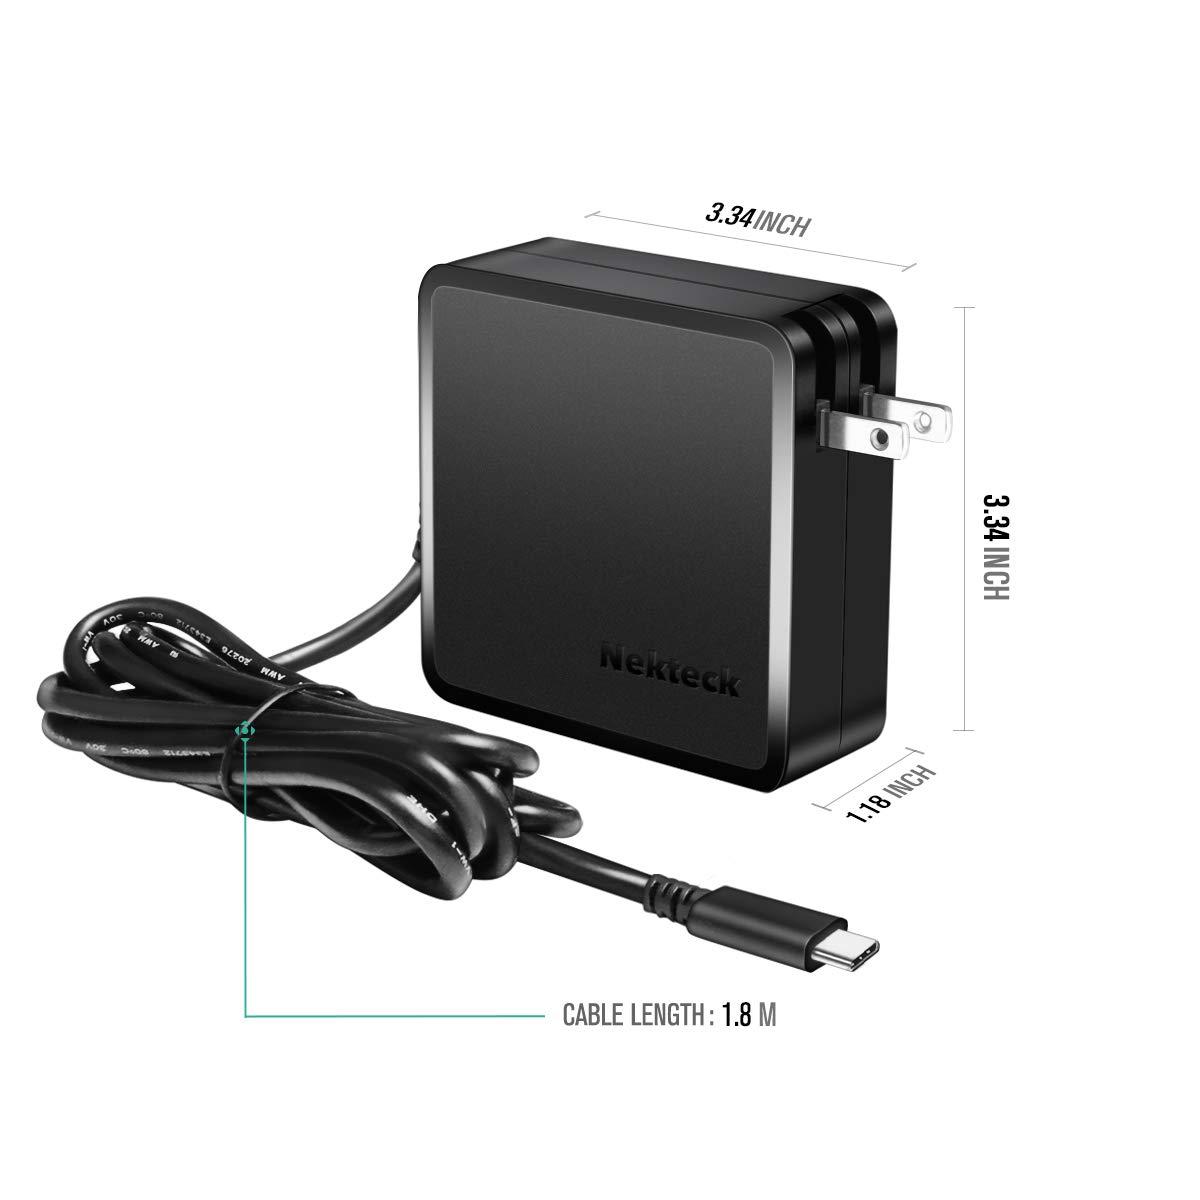 Amazon.com: USB tipo C cargador de coche, nekteck Dual Quick ...